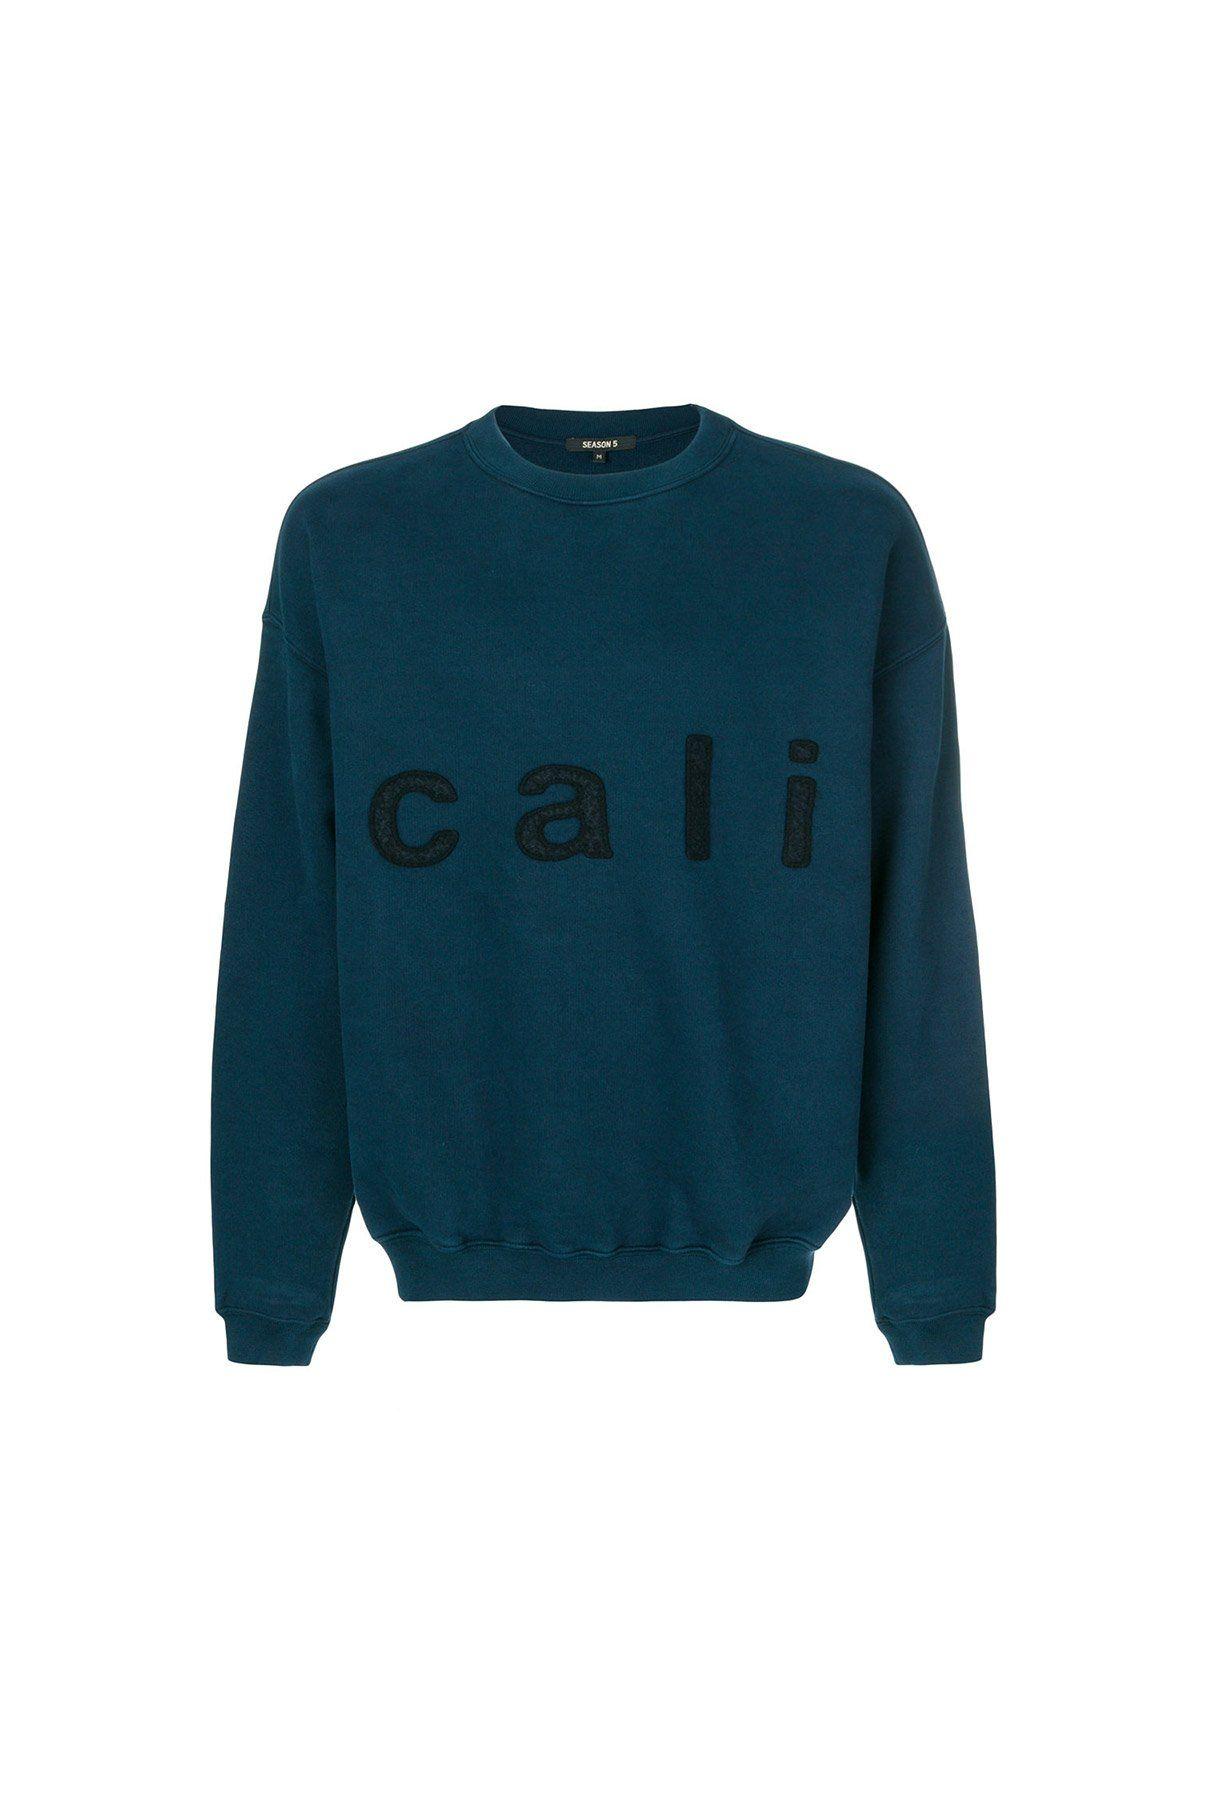 Yeezy Season 5 Cali Sweatshirt Sweatshirts Mens Sweatshirts Clothes Design [ 1812 x 1208 Pixel ]